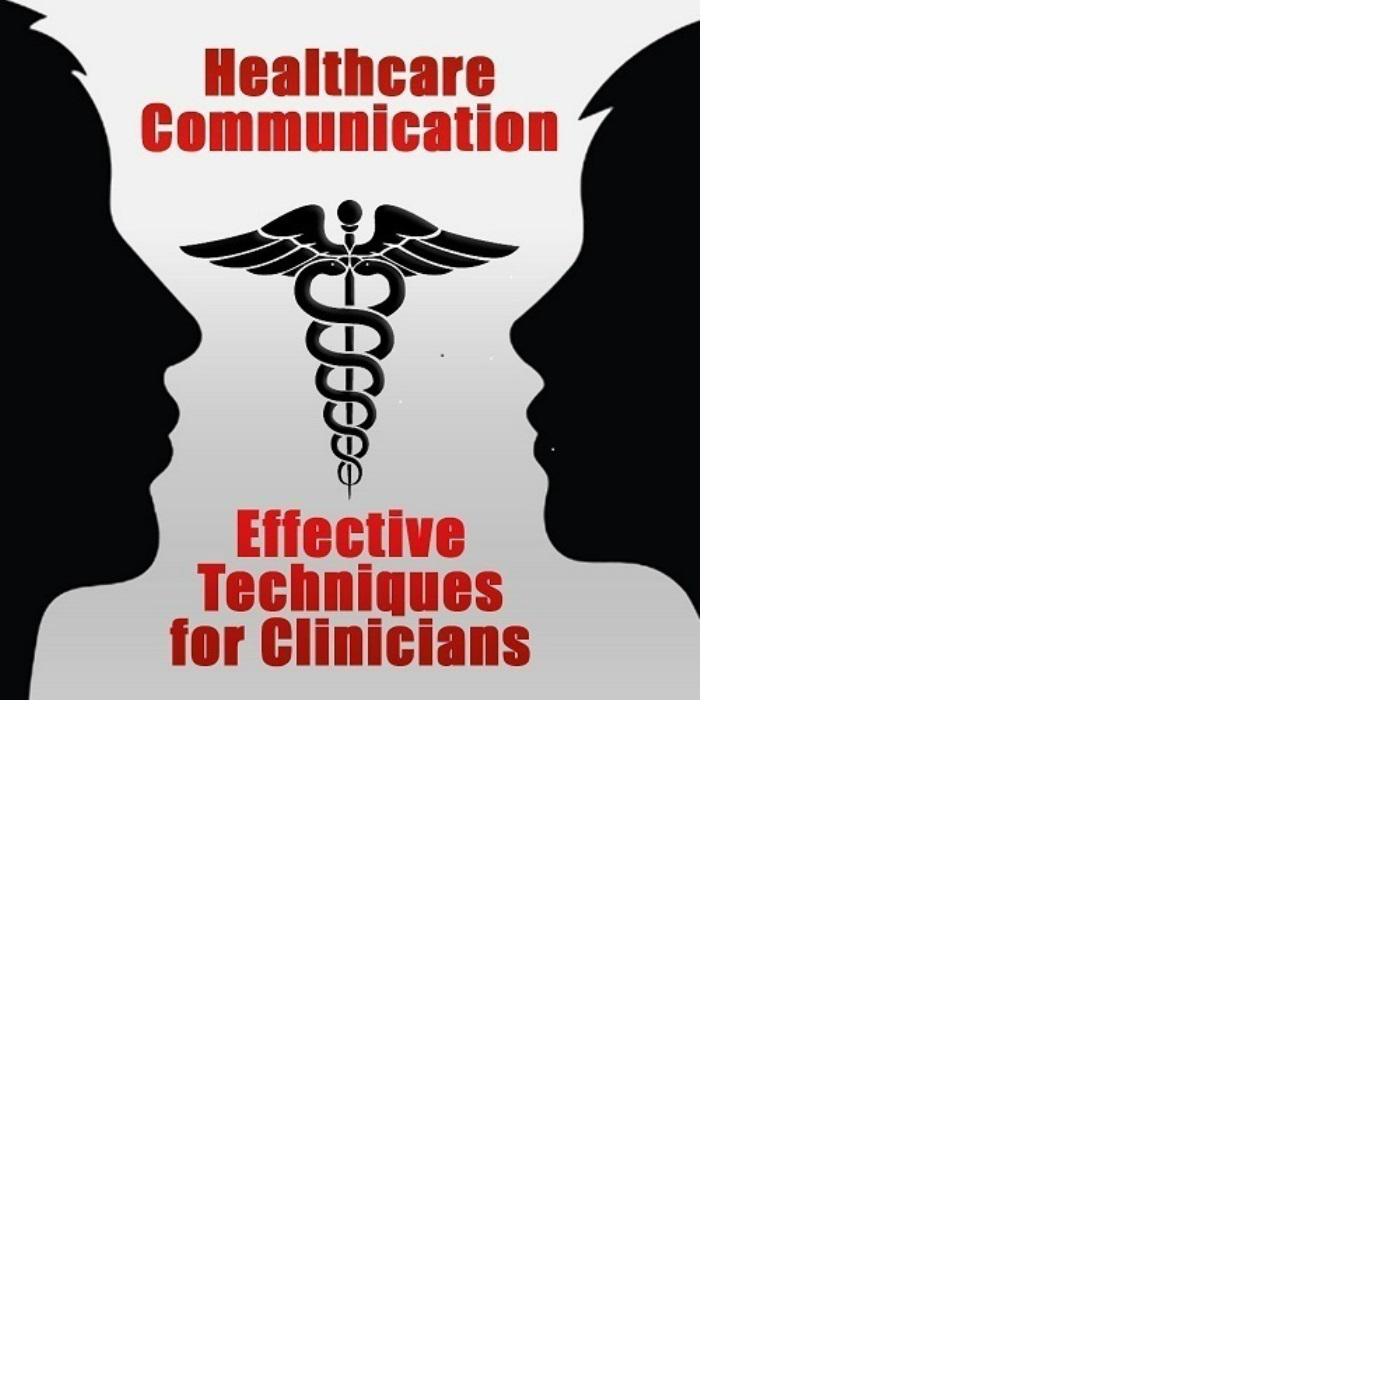 Difficult Conversations When Prescribing Longitudinal Controlled Drugs